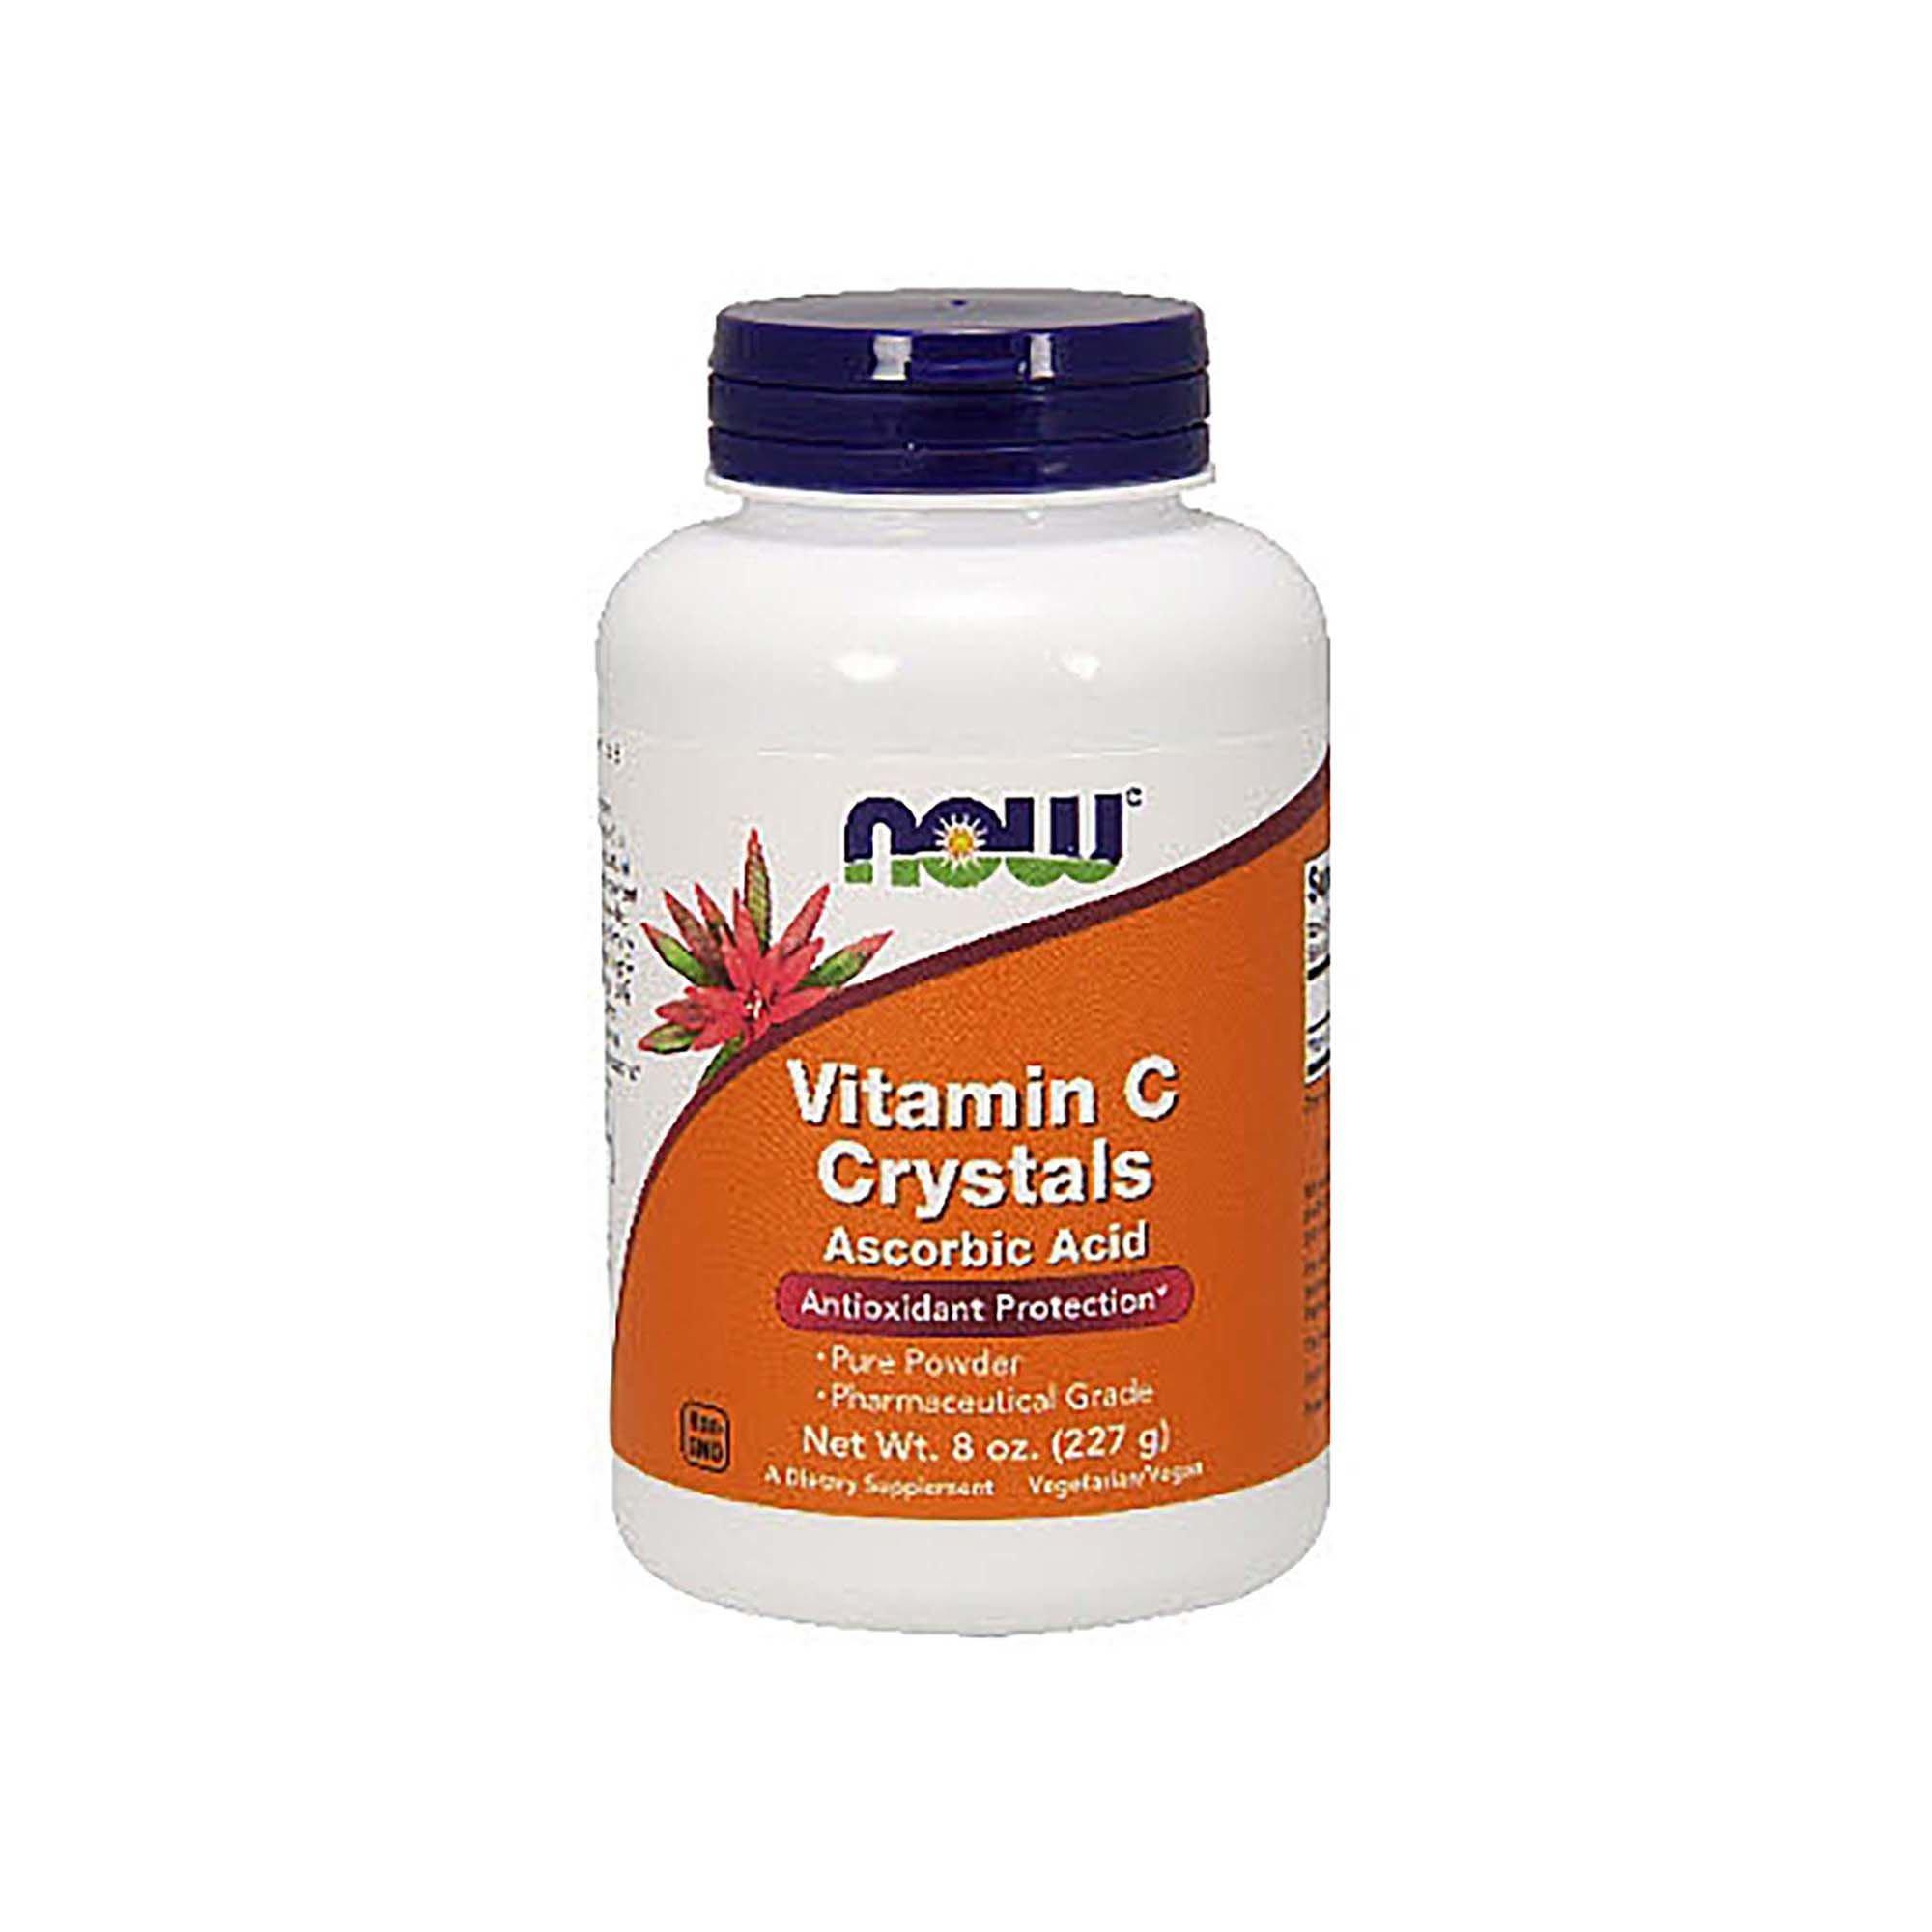 Now Foods Vitamin C Crystals, 8oz/227g